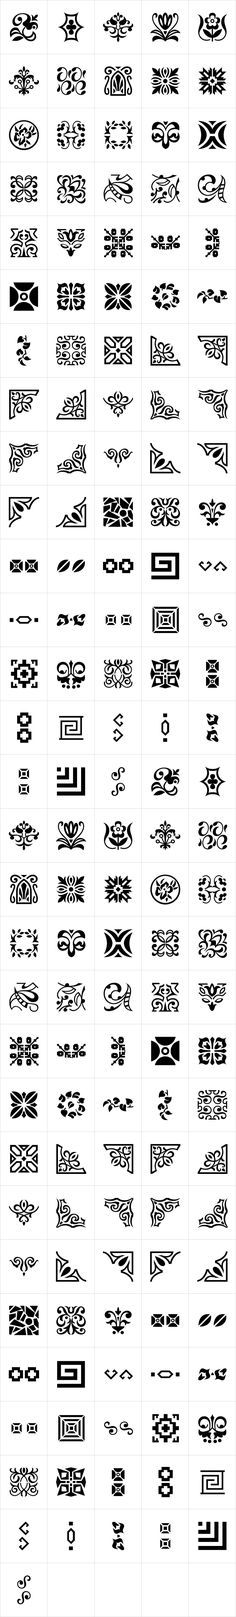 Ornament by ParaType - Desktop Font and WebFont - YouWorkForThem